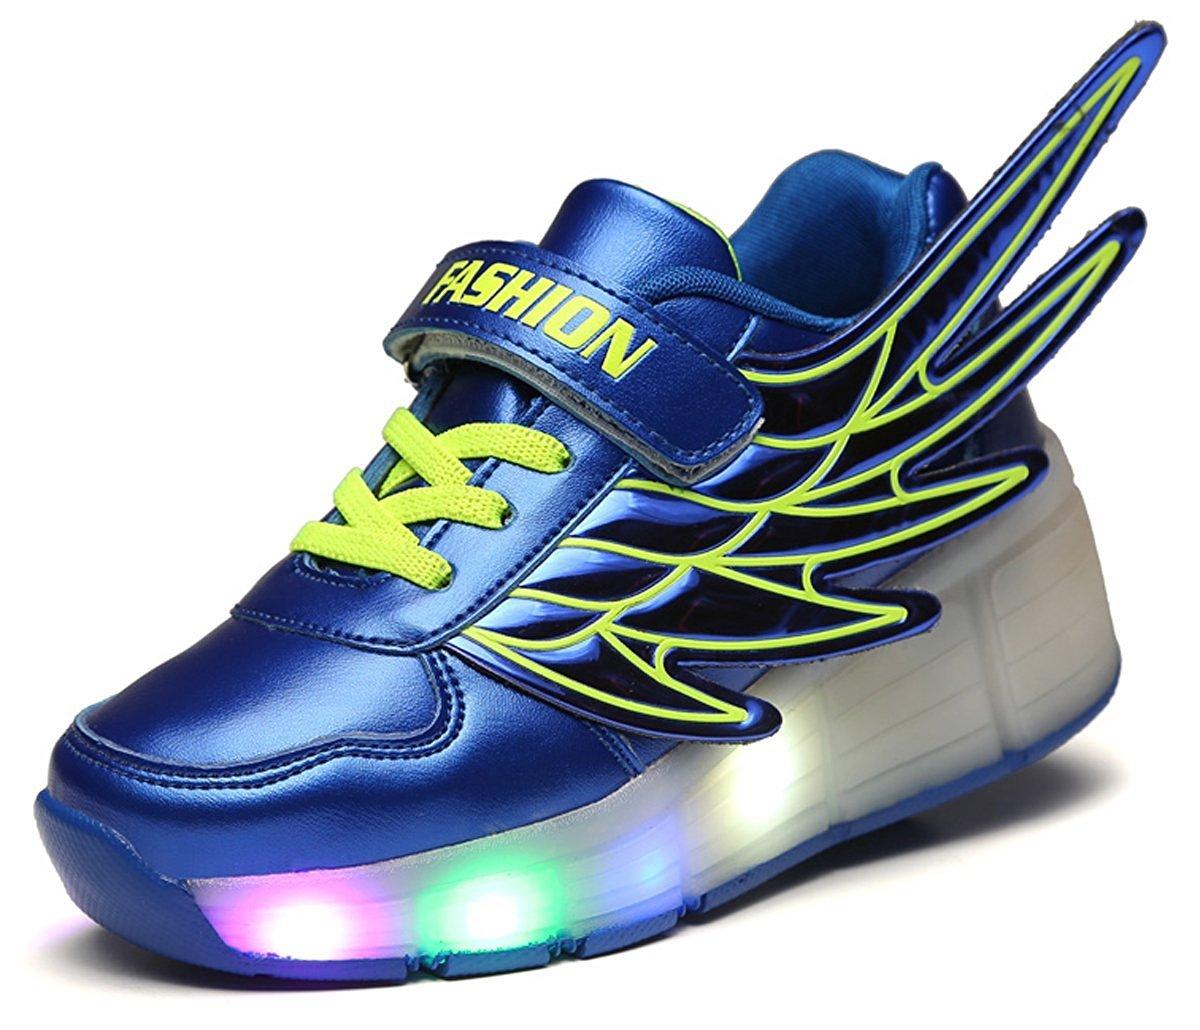 pit4tk LED Light Up Roller Wheel Shoes Athletic Sneaker Sport Shoe Dance Boot Kid Wing Christmas Blue